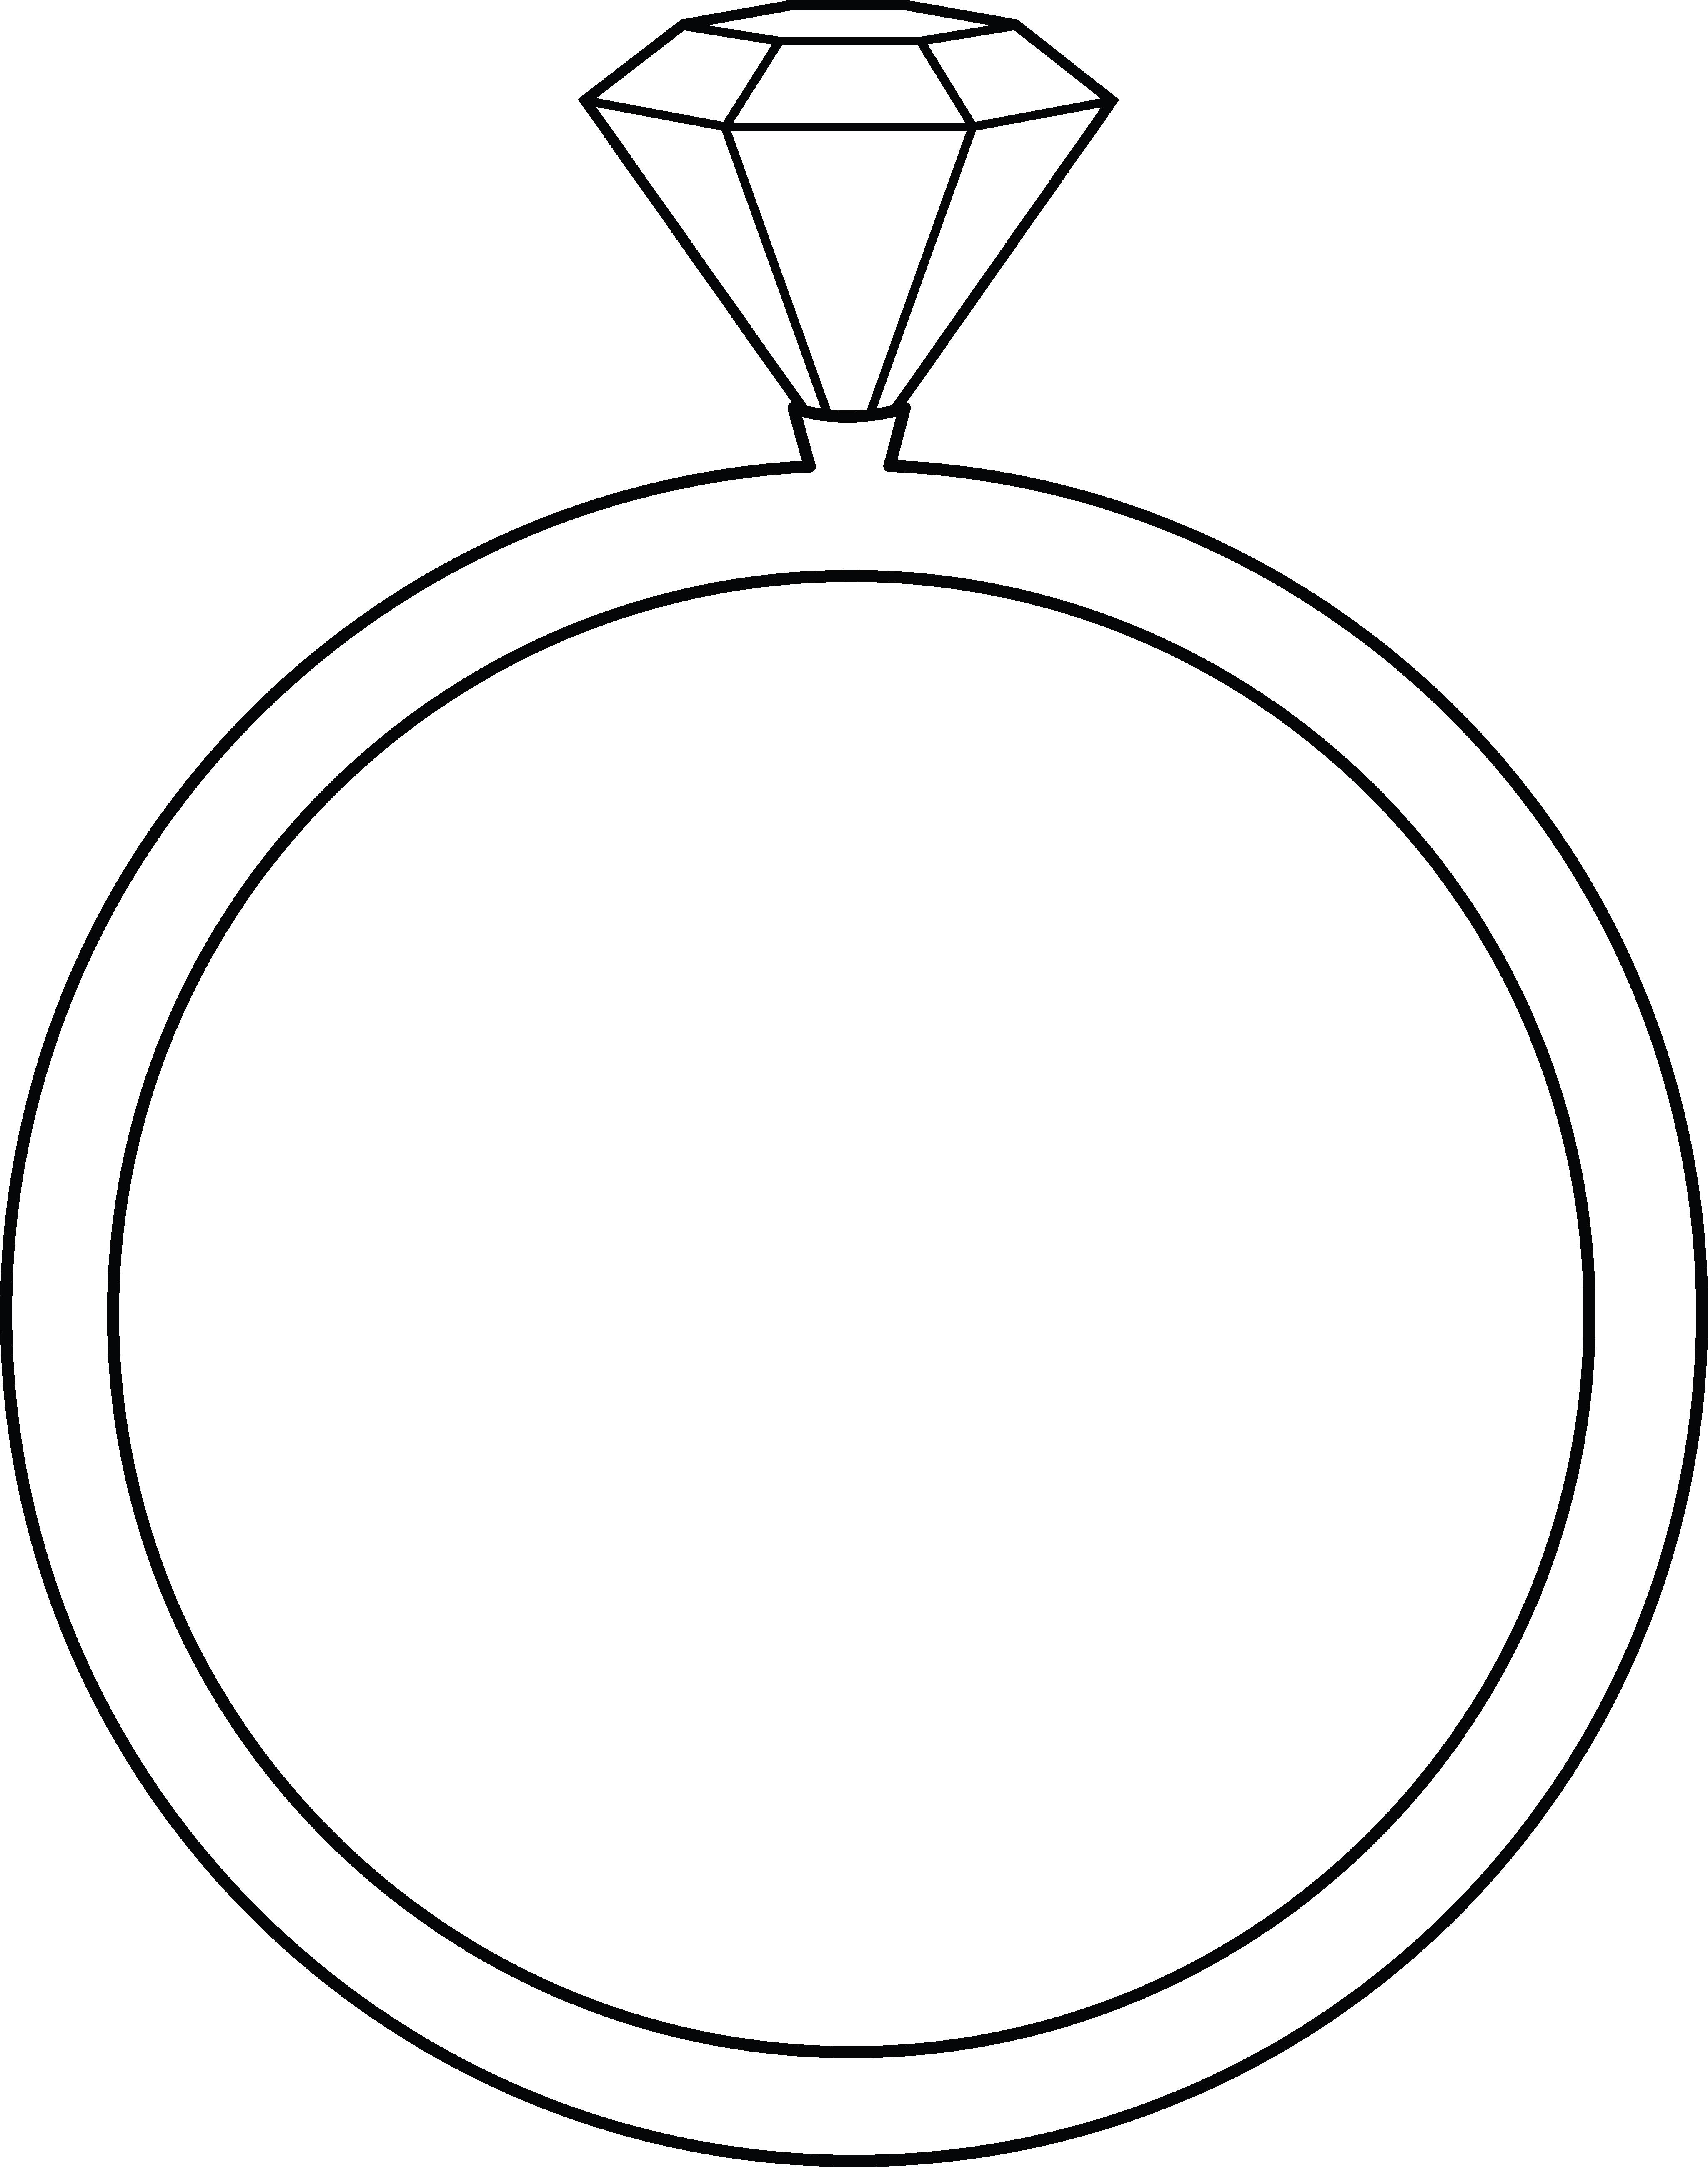 Best Wedding Ring Clipart #16478.